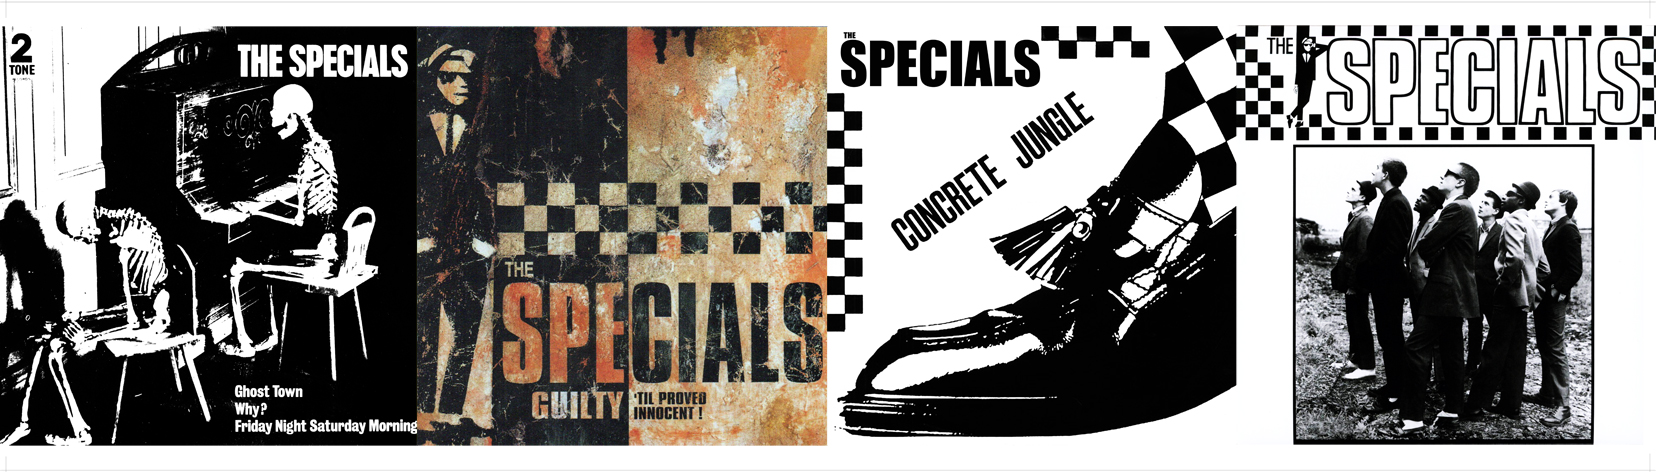 Specials-SHADE1